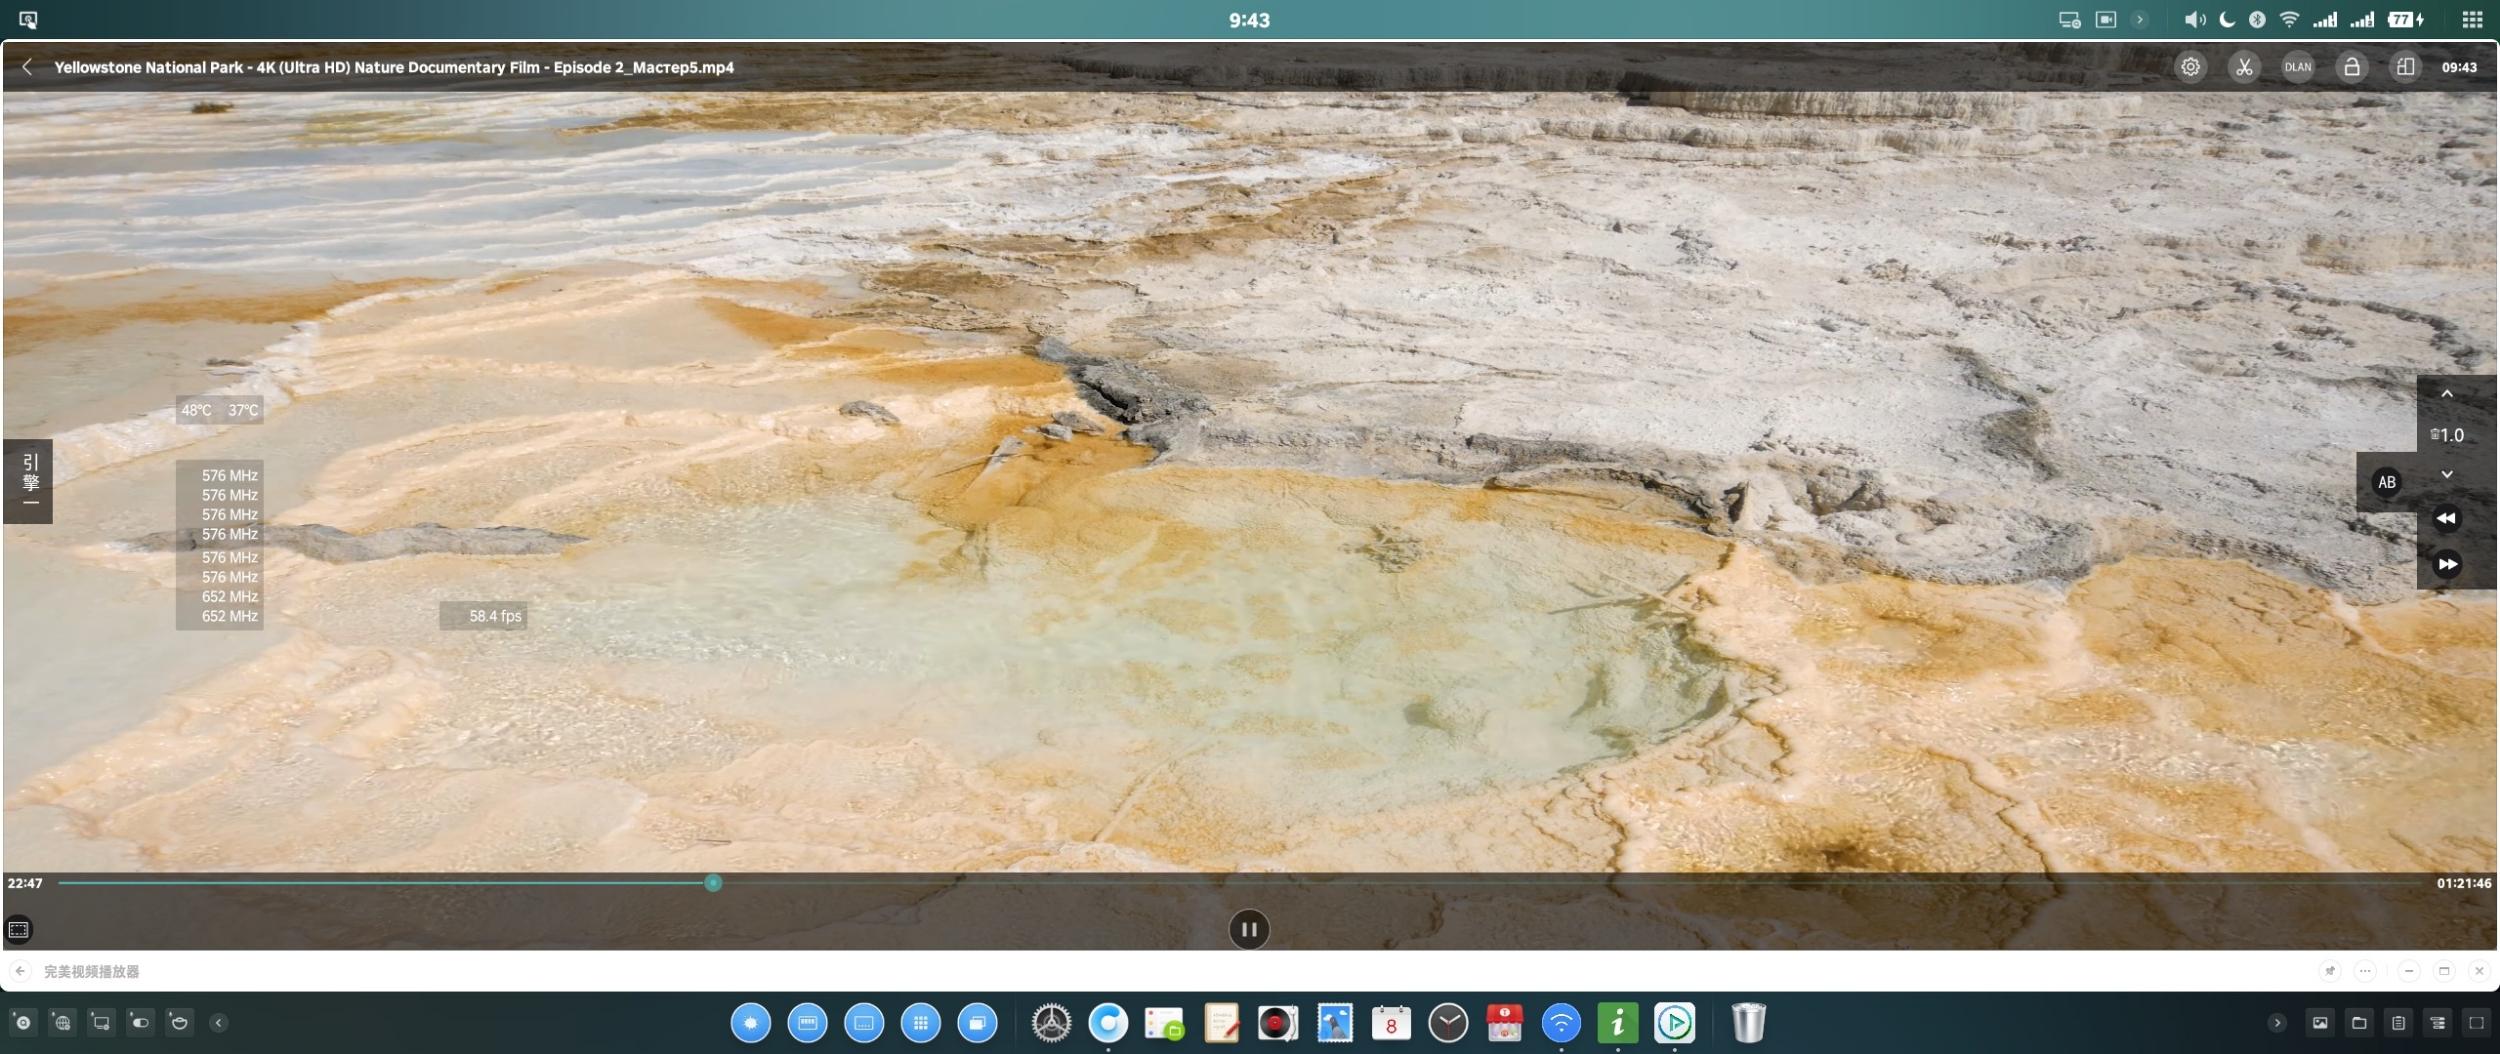 Screenshot_2021-05-08-09-43-27-791_fullscreen.jpg